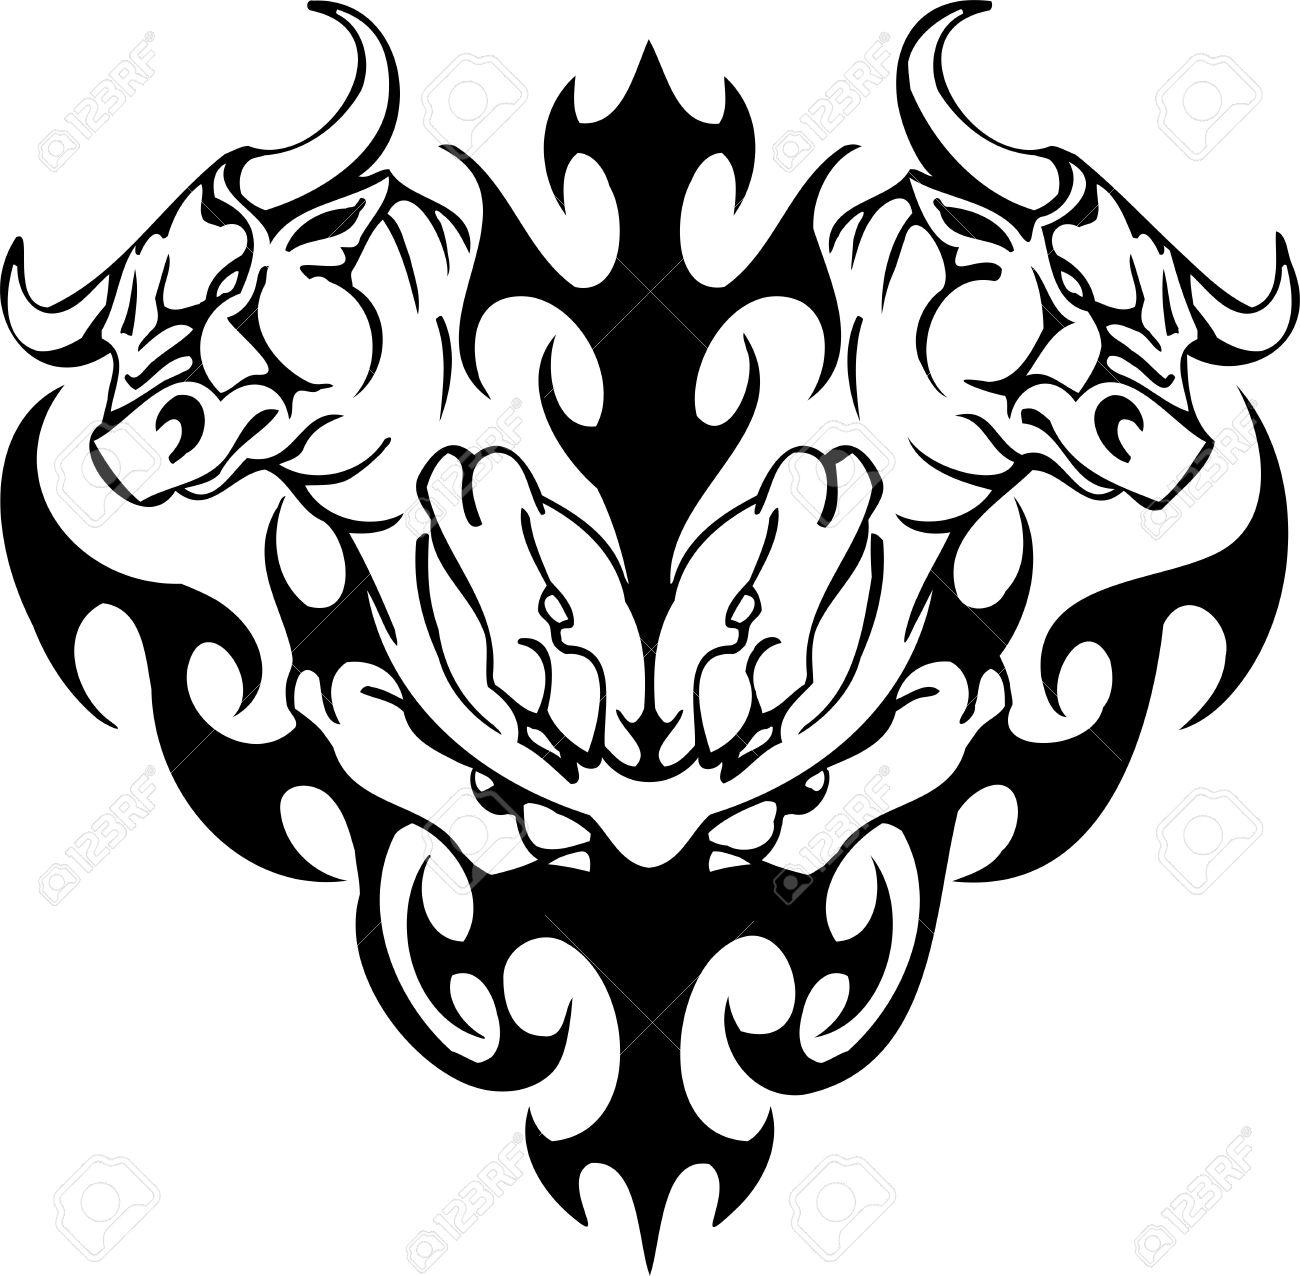 Bull in tribal style - vector image. Stock Vector - 12490478